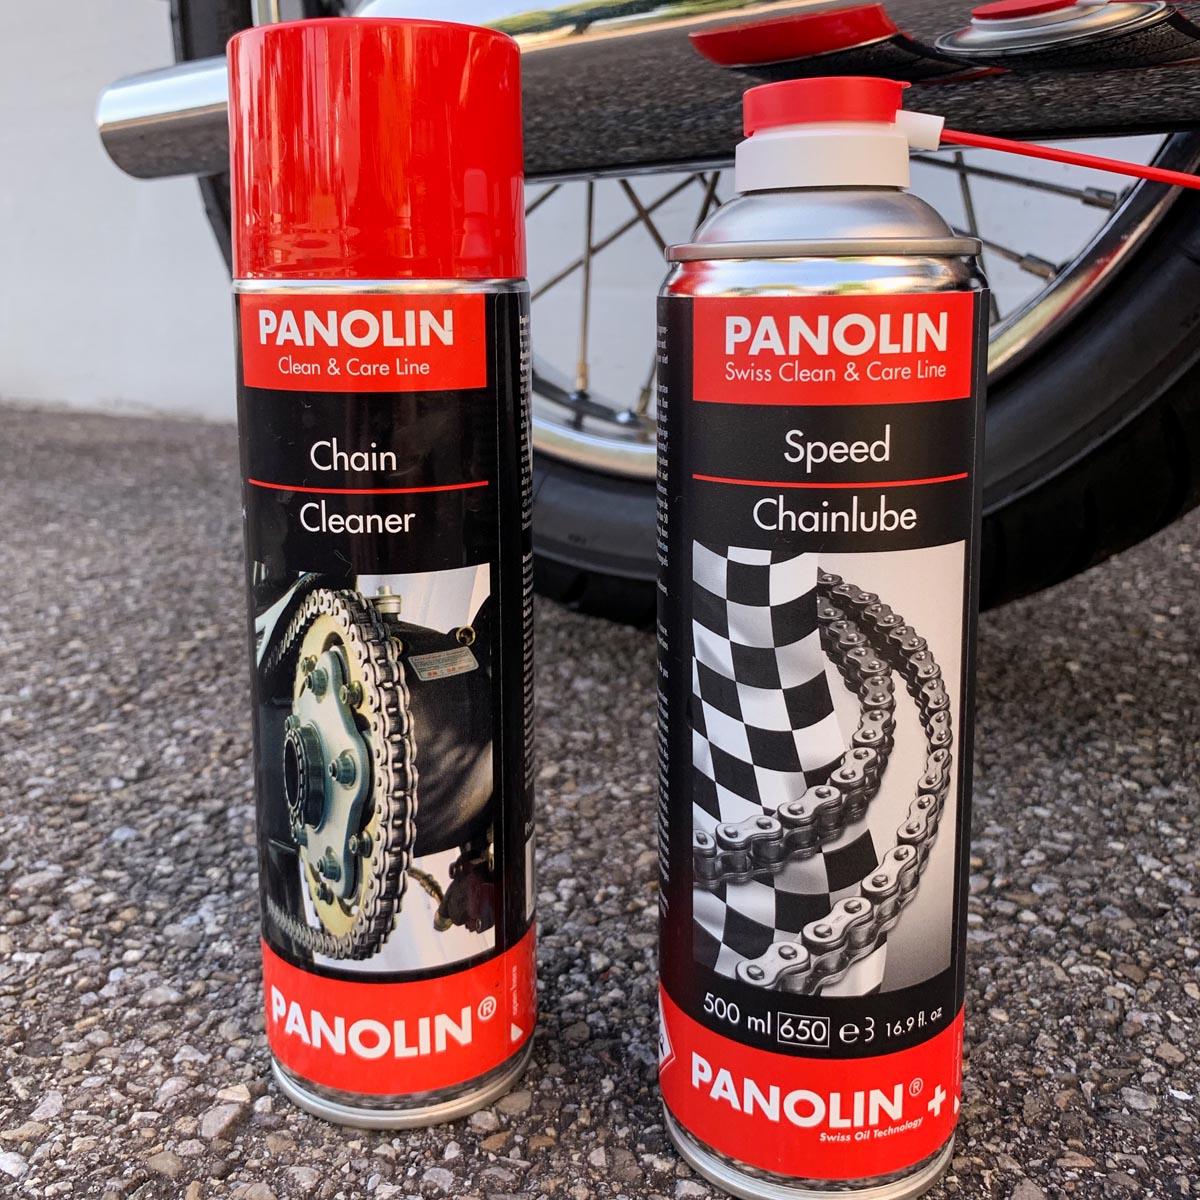 PANOLIN CHAIN CLEANER & PANOLIN SPEED CHAINLUBE Spray